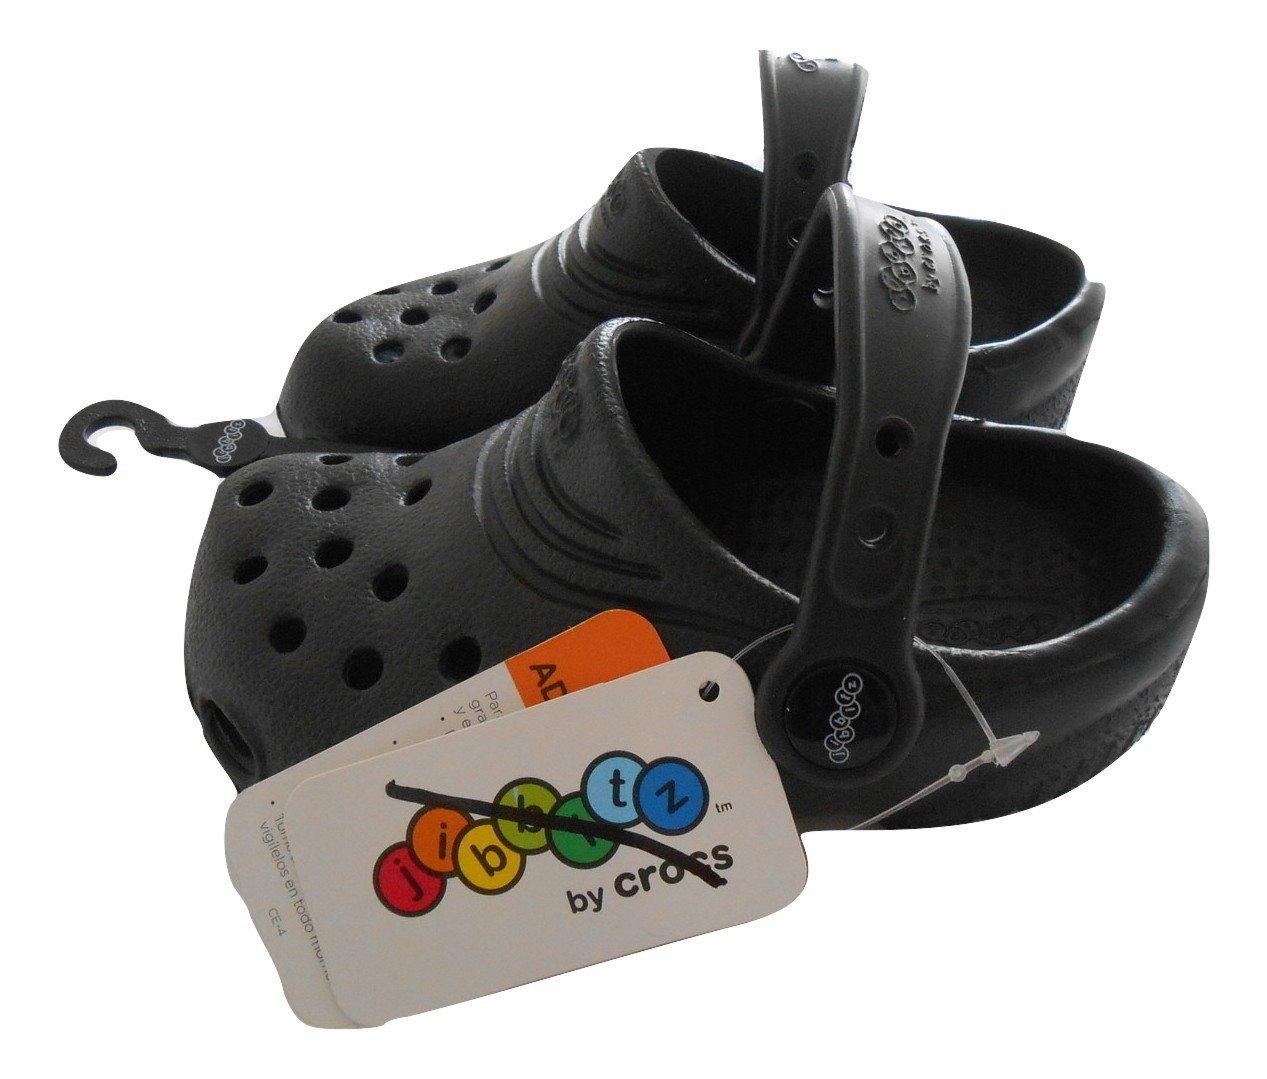 d005a6b1dcc Jibbitz By Crocs Black Croc Girl s Shoes Size 8 9 New Nwt